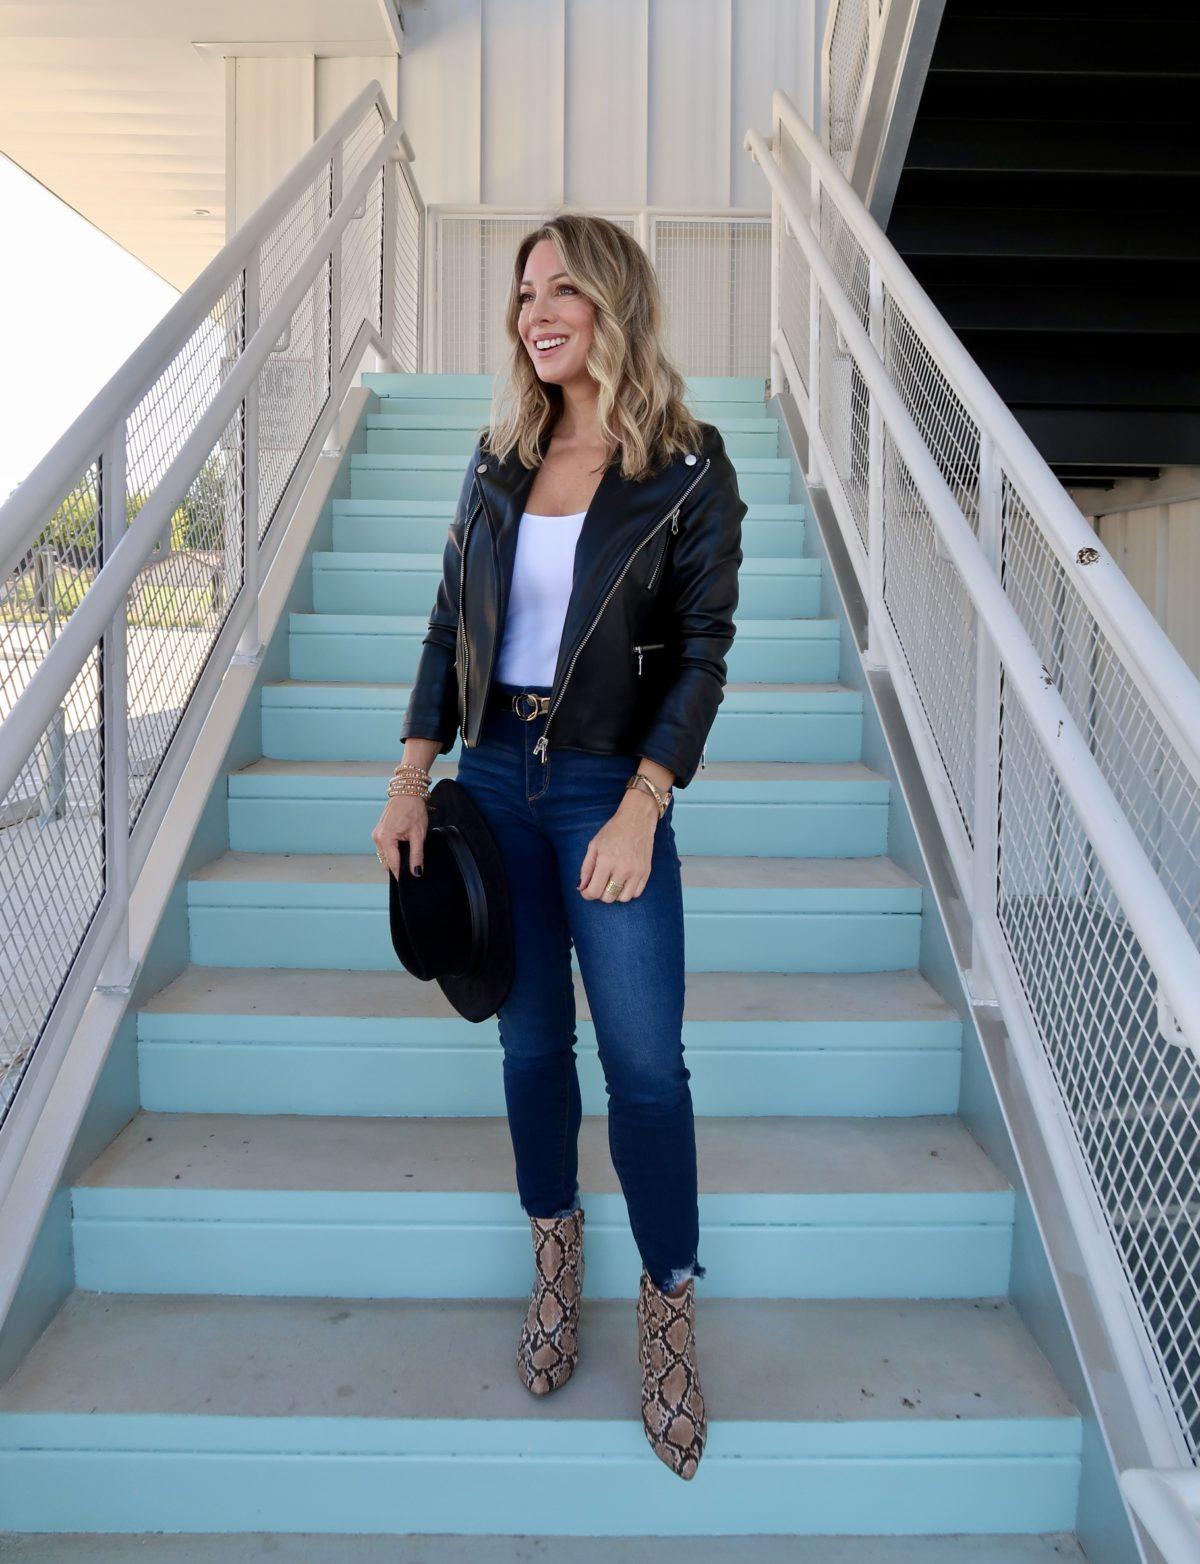 Walmart Fashion Finds, Faux Leather Jacket, Bodysuit, Jeans, Booties